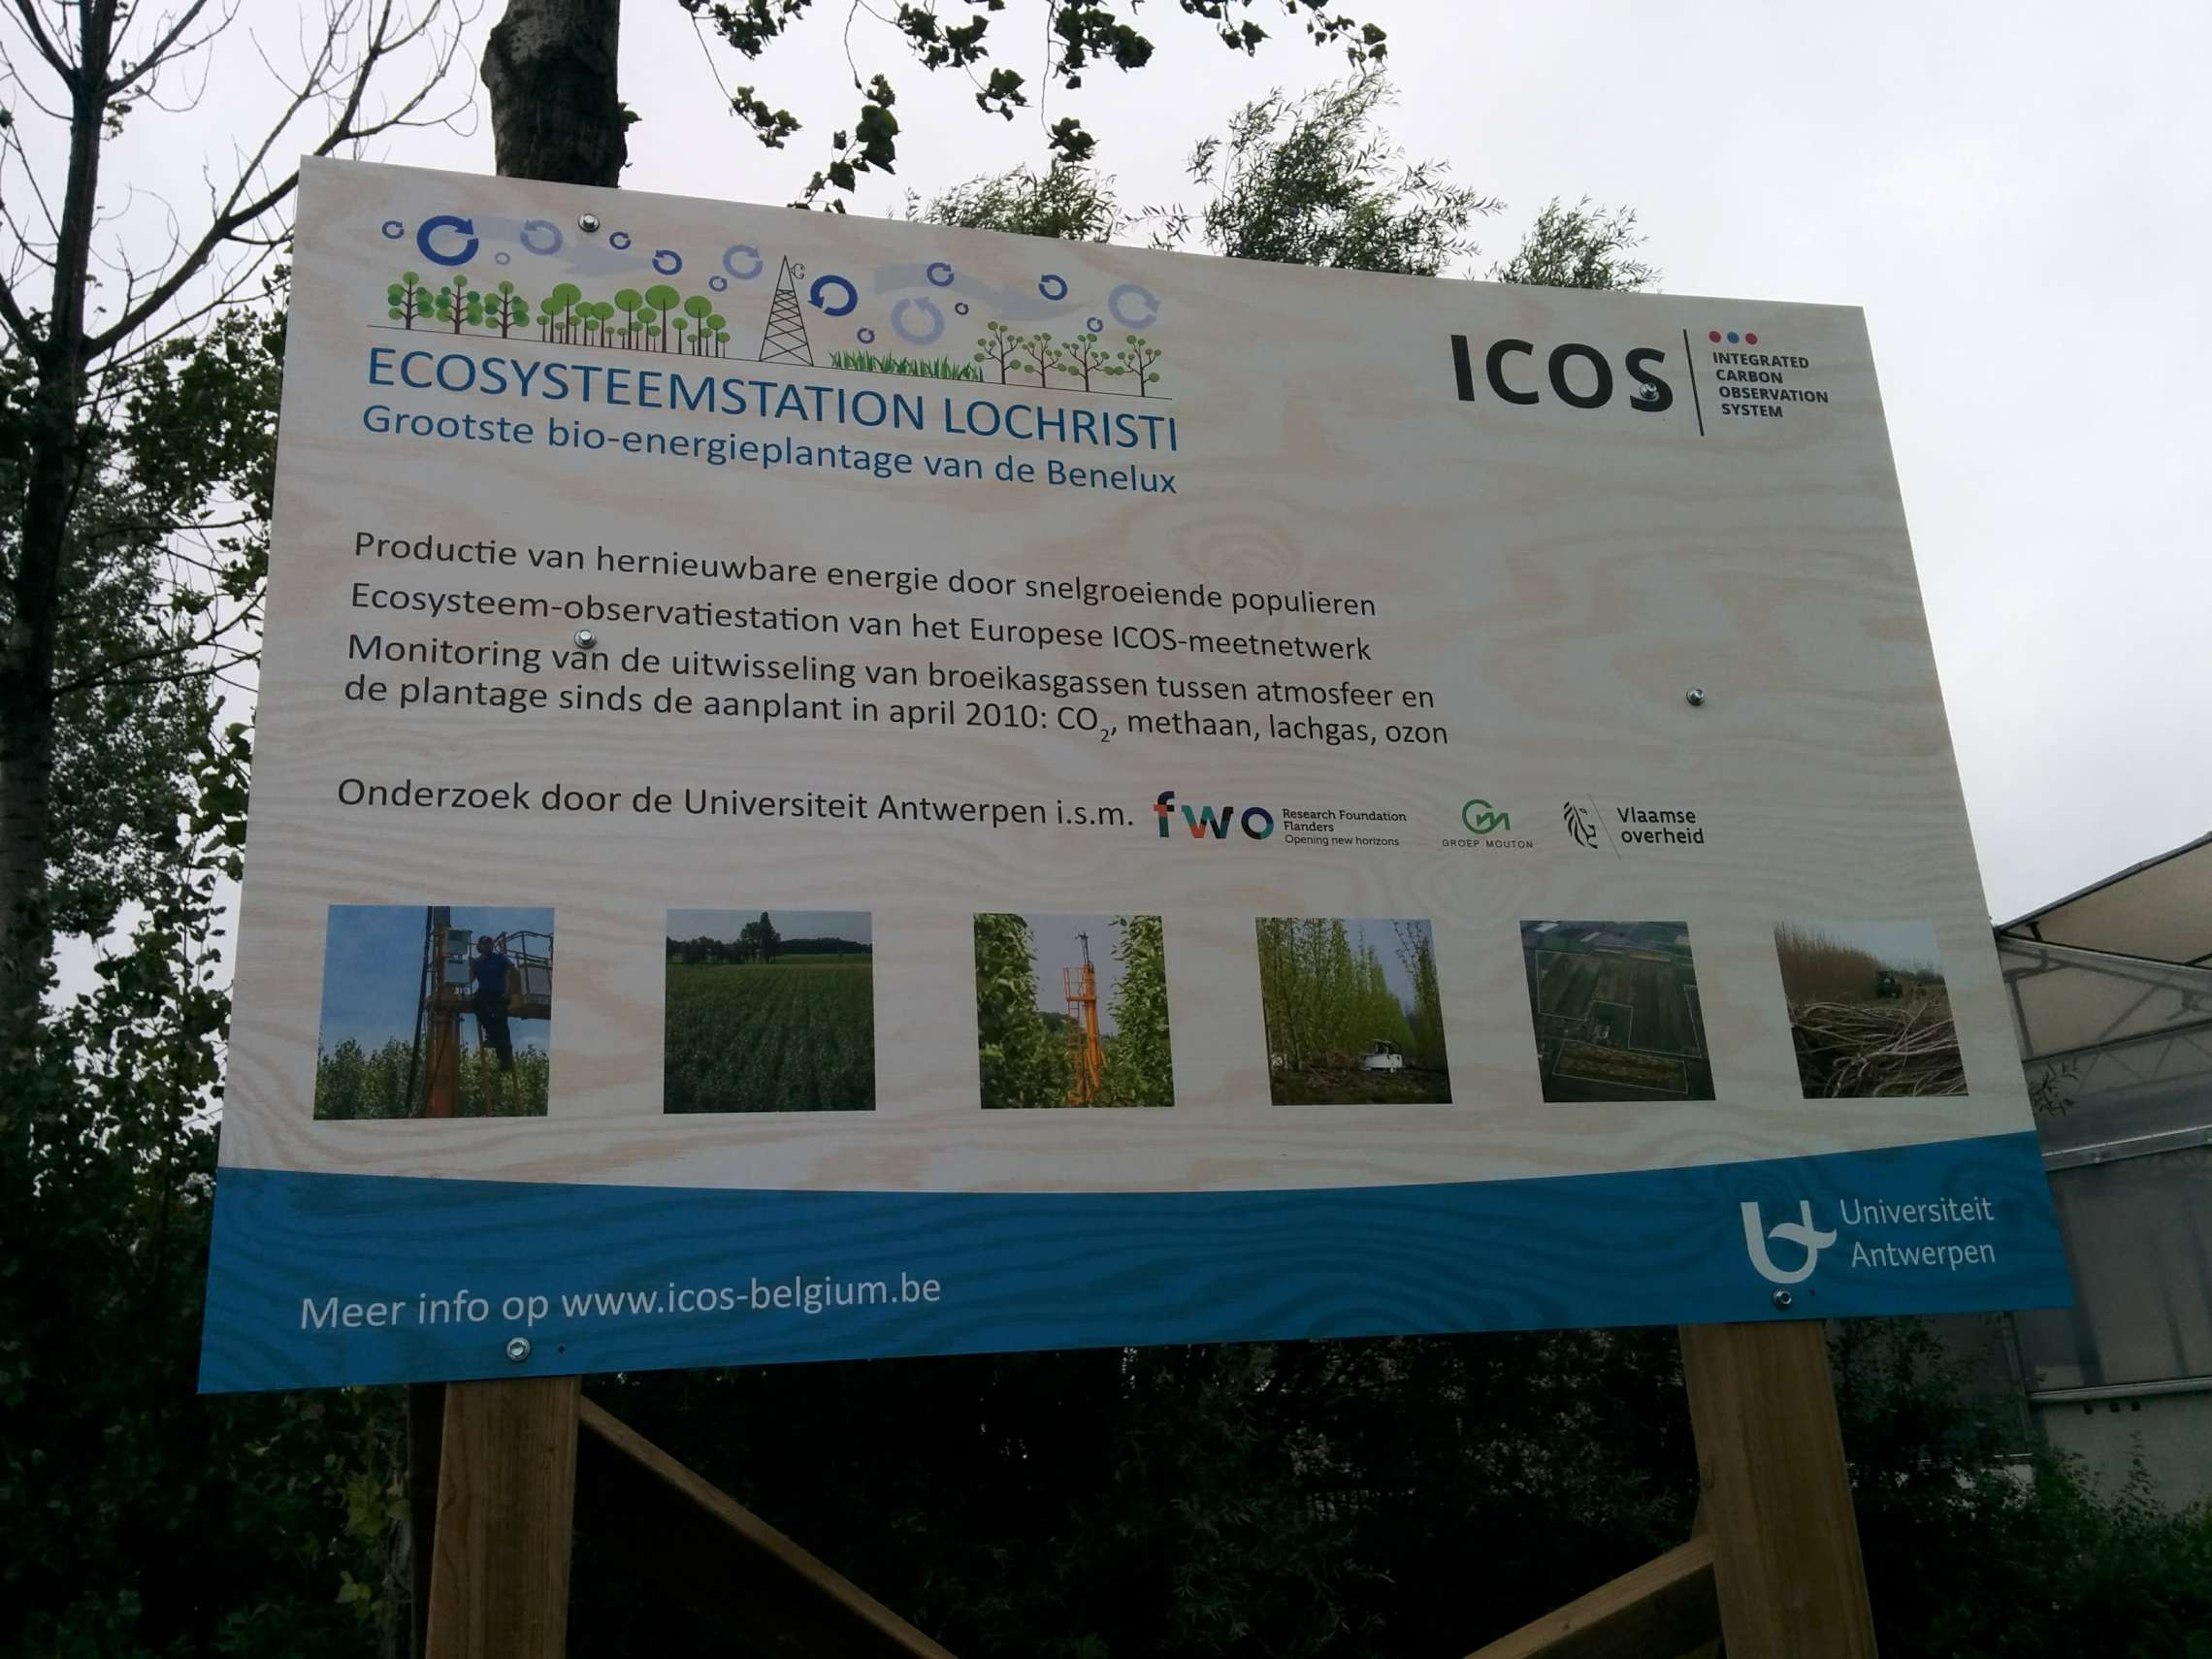 New infomation panels lochristi